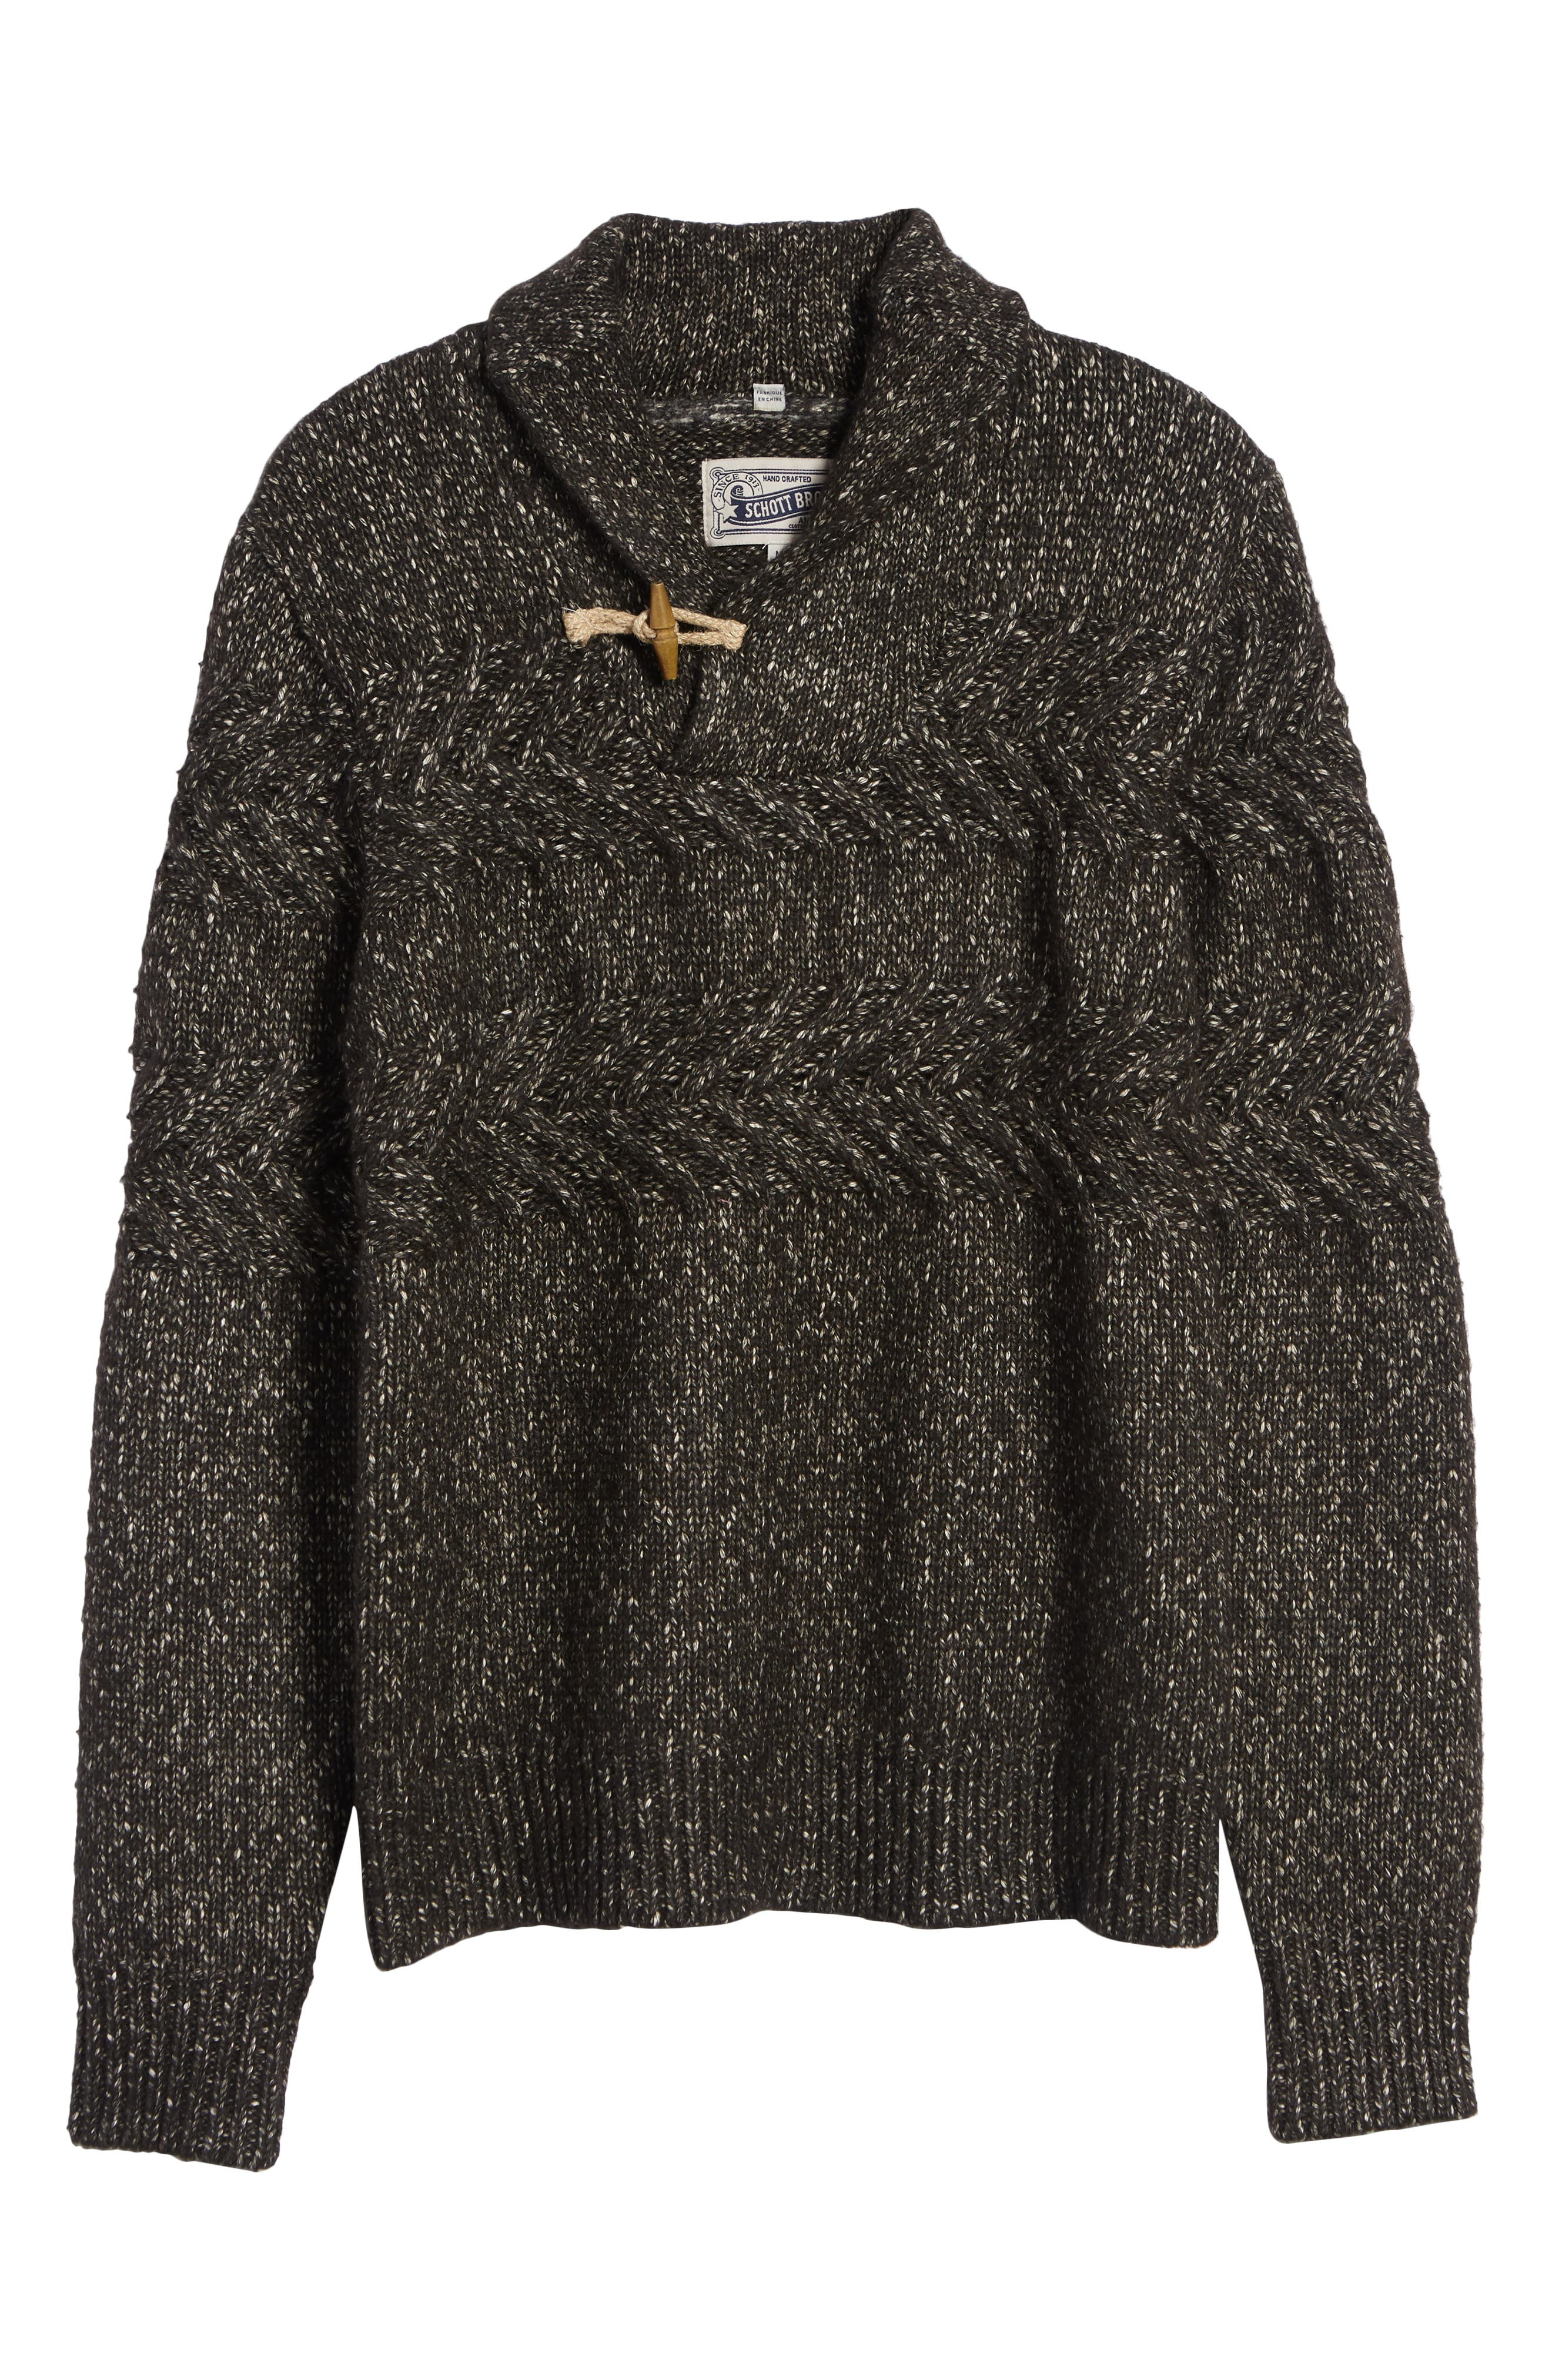 SCHOTT NYC,                             Heathered Shawl Collar Sweater,                             Alternate thumbnail 6, color,                             BLACK